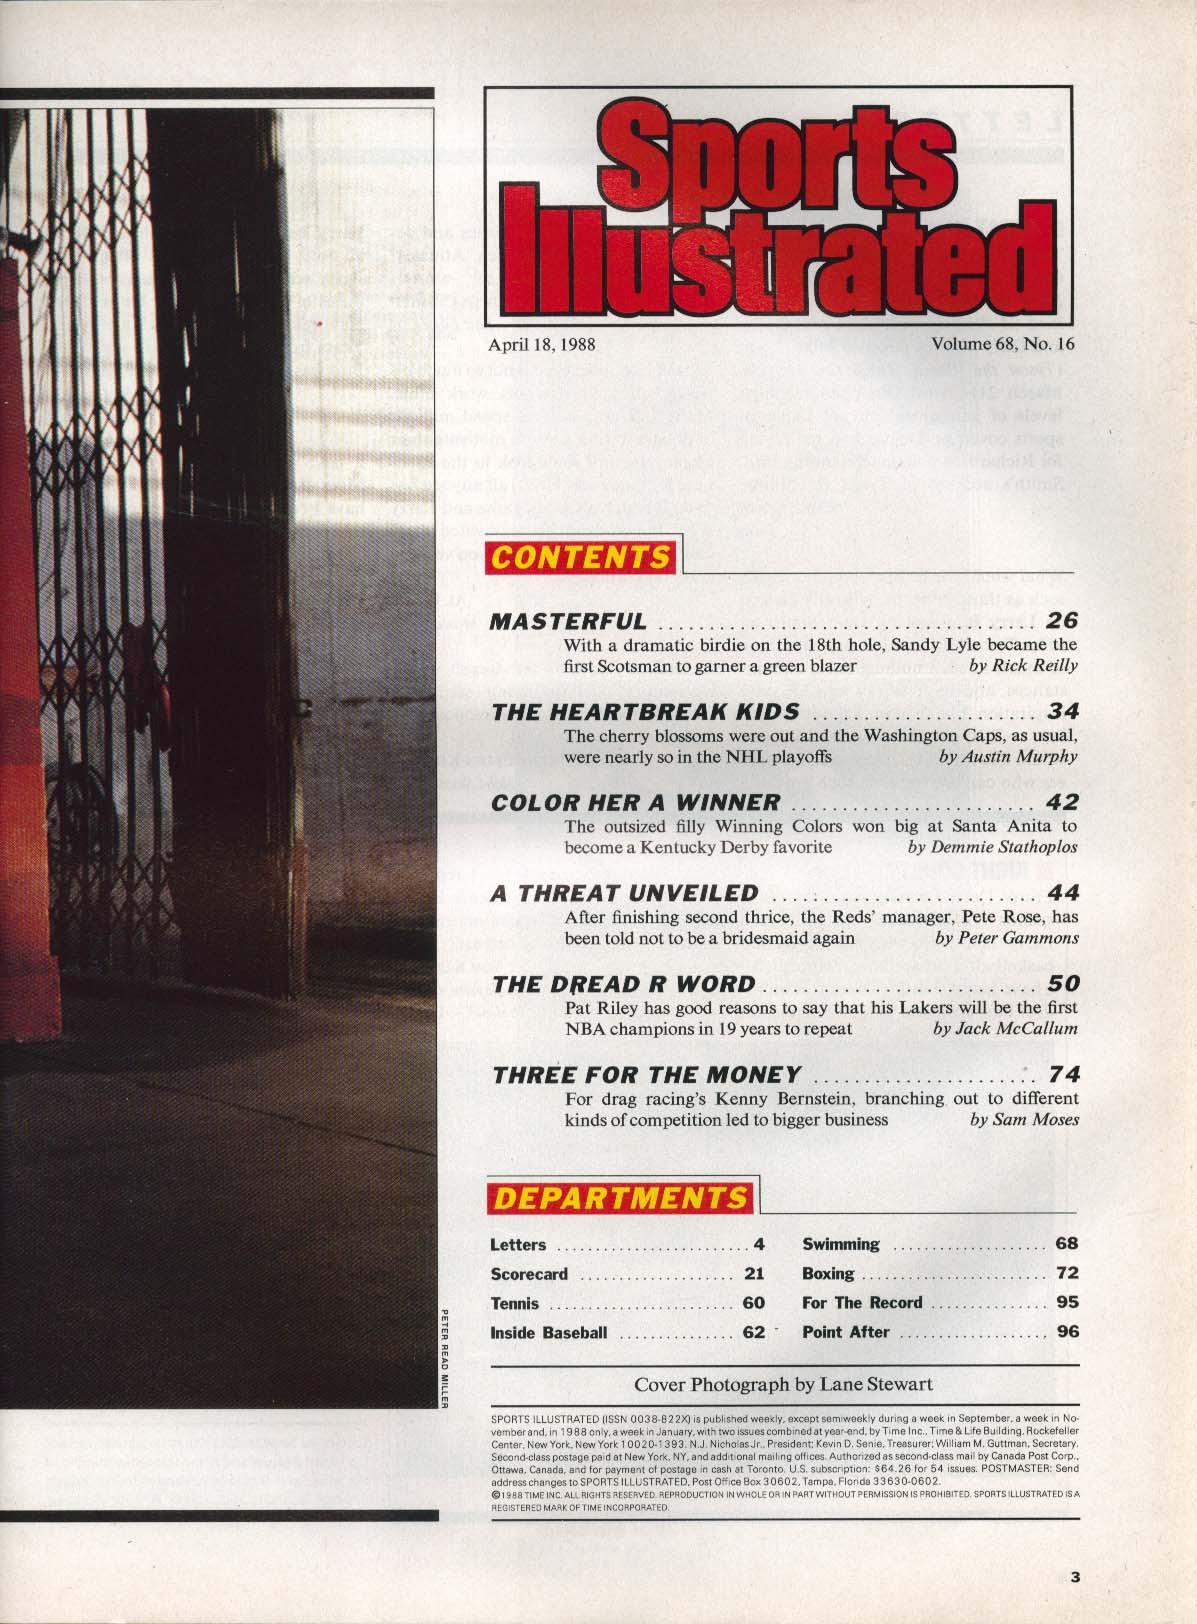 SPORTS ILLUSTRATED Sandy Lyle Pete Rose Pat Riley Kenny Bernstein 4/18 1988